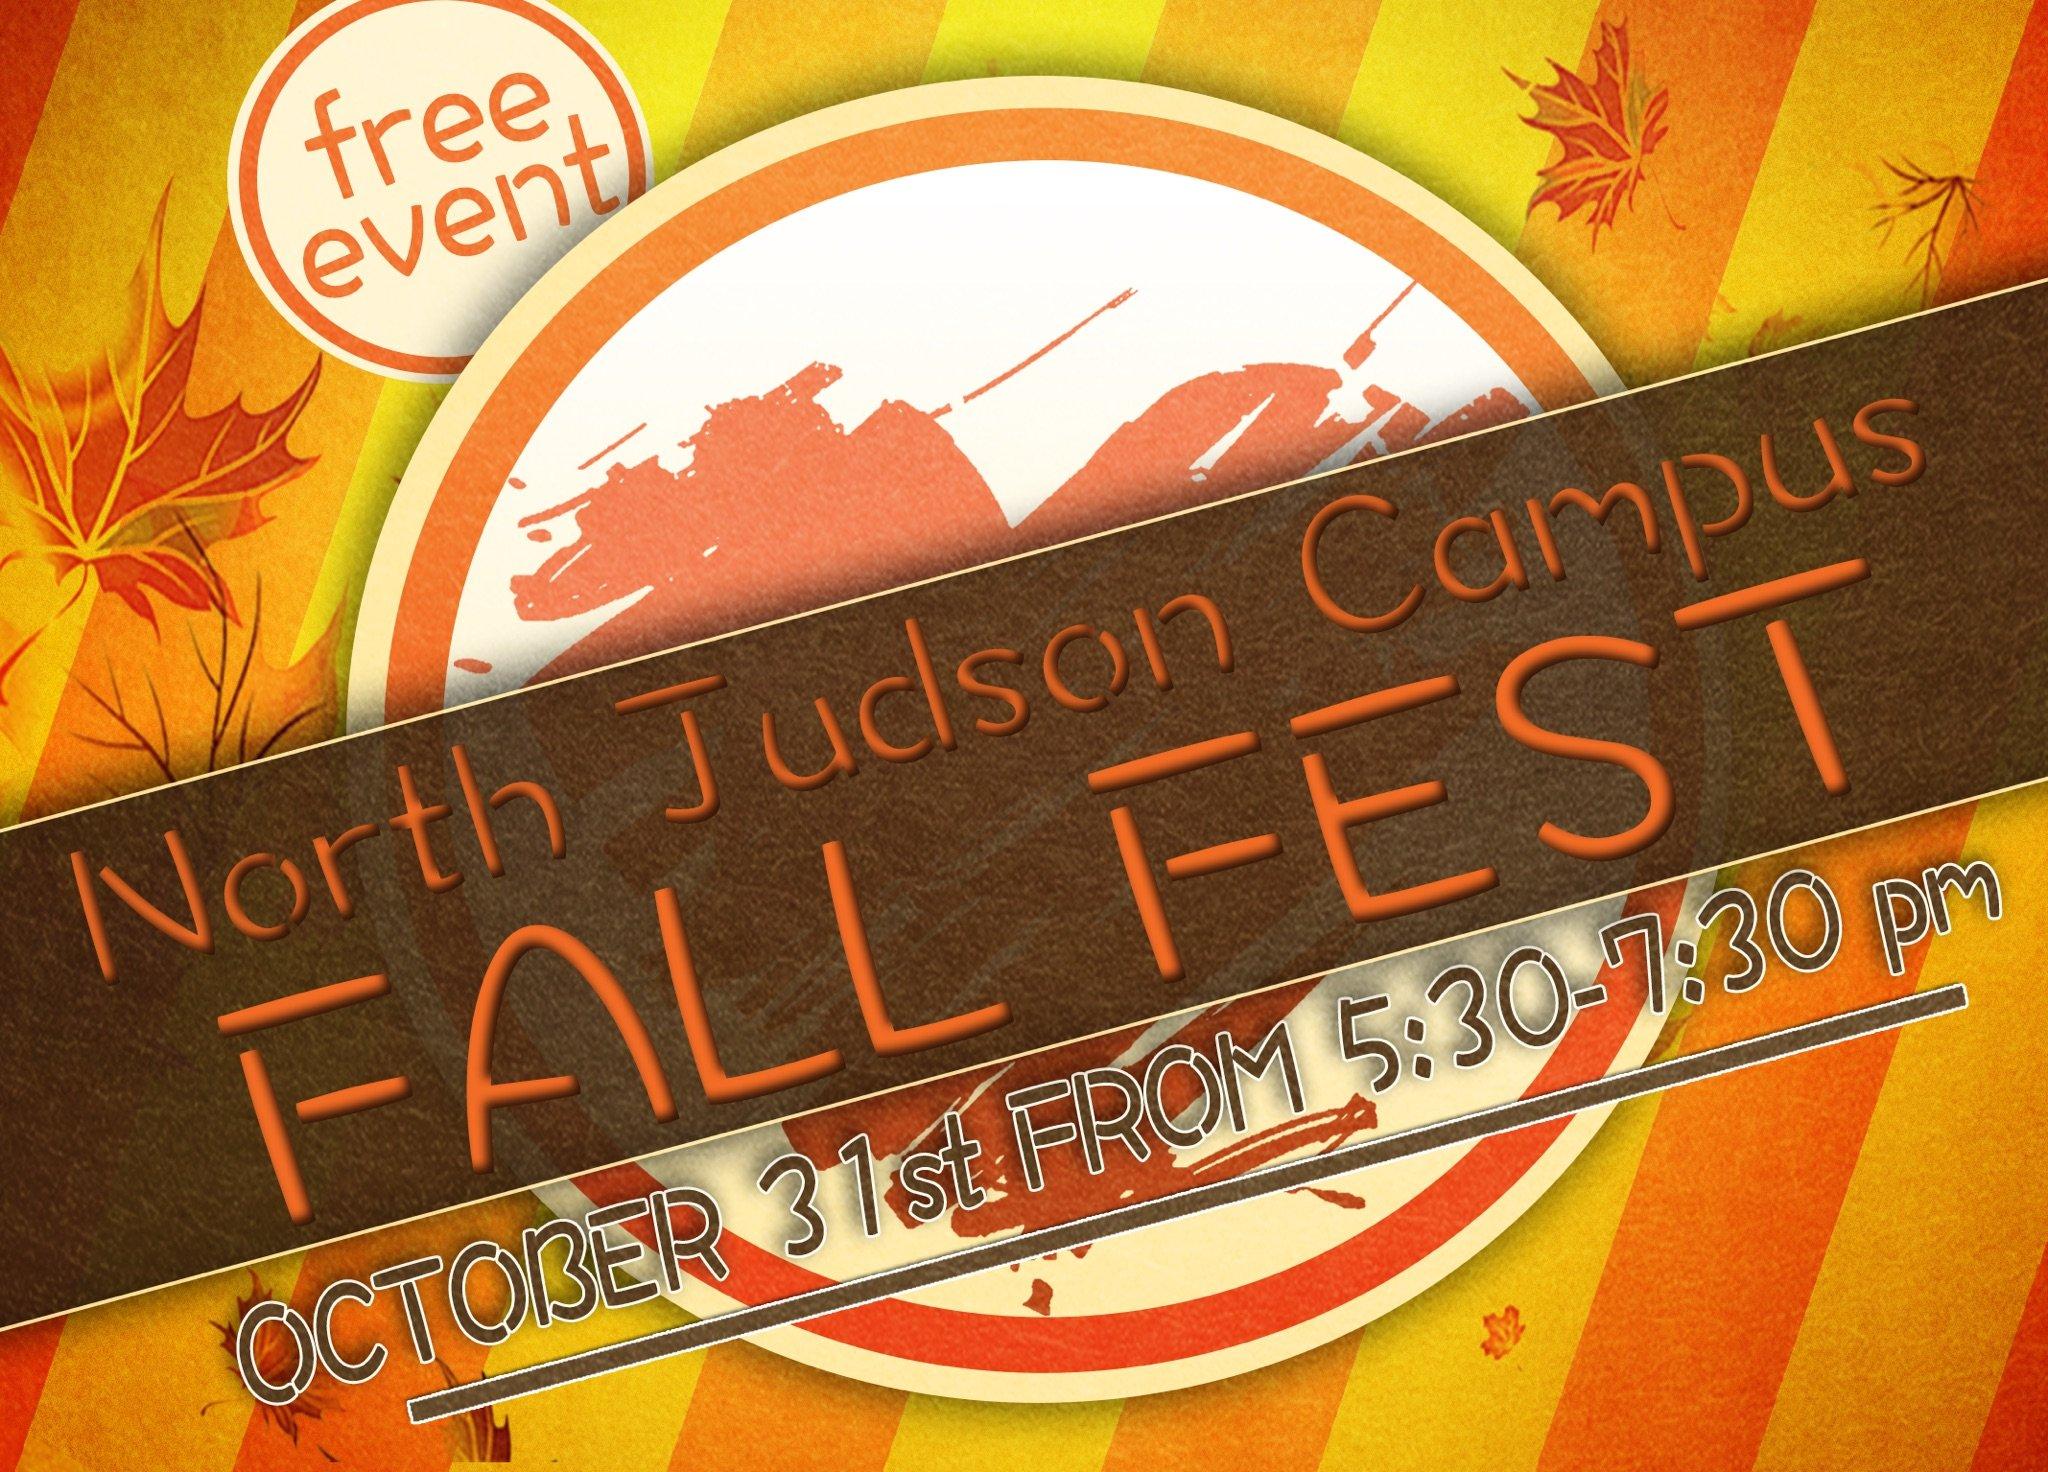 North Judson 2018 Fall Fest